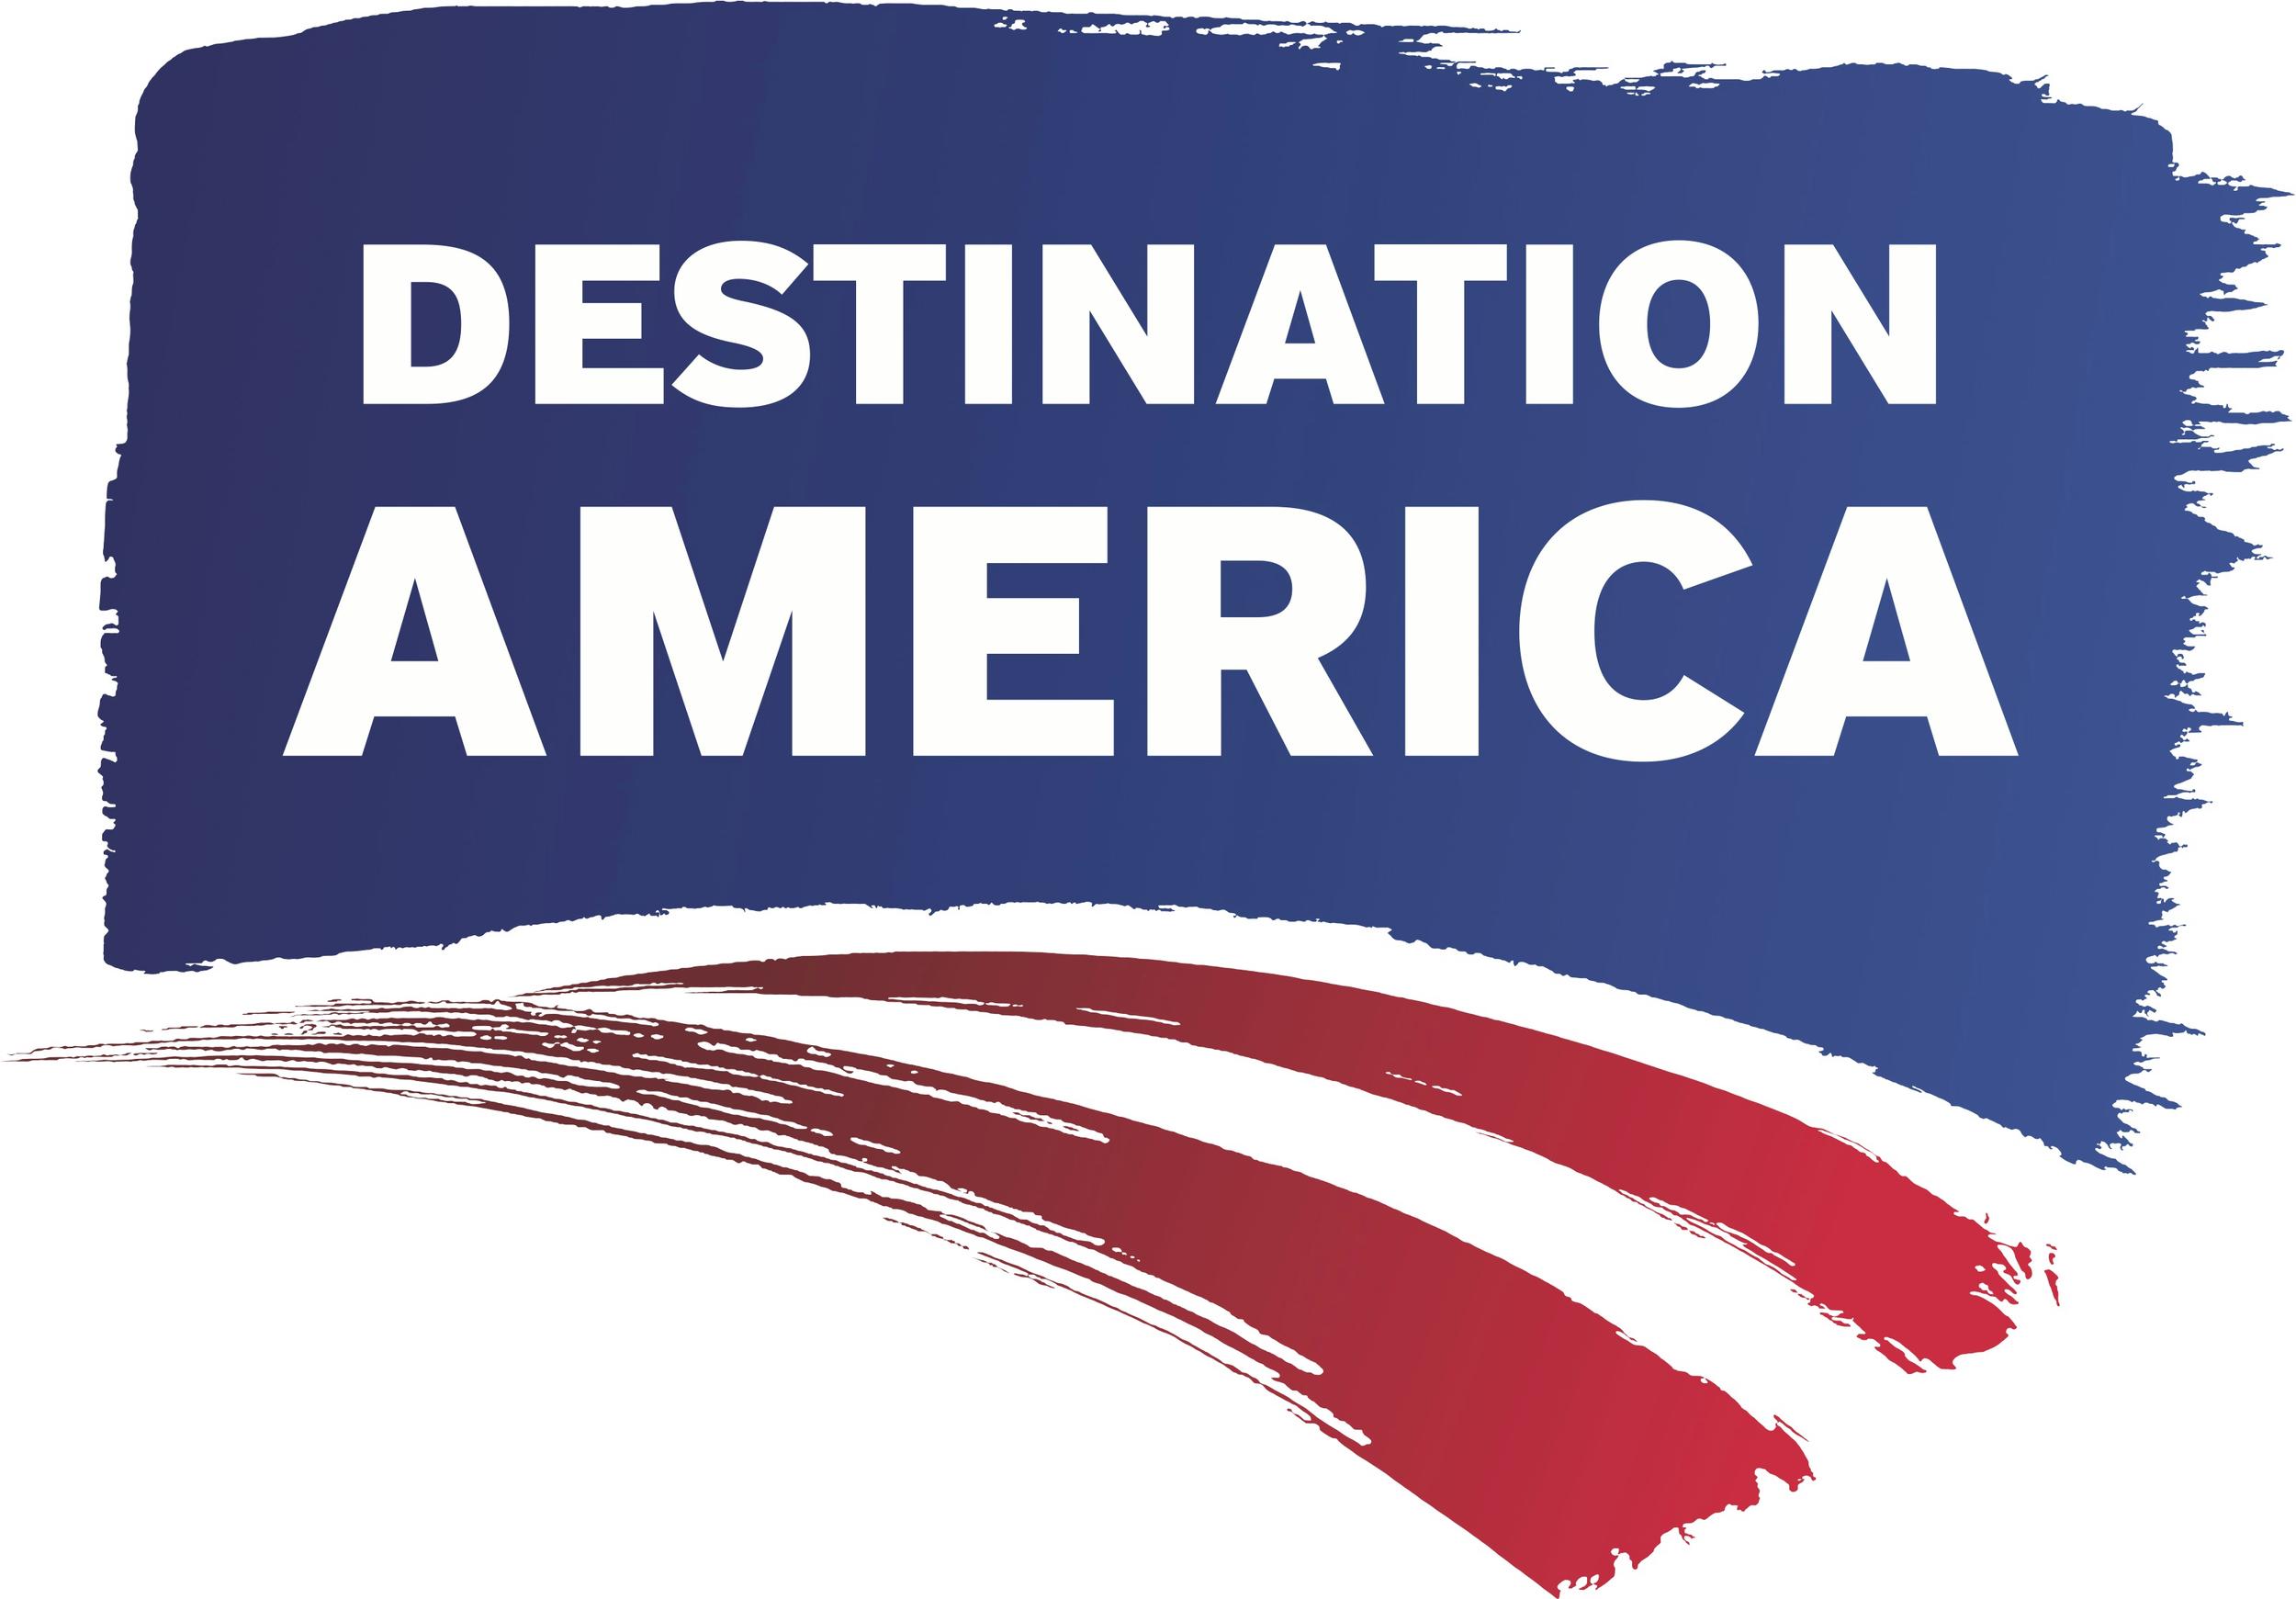 Jay Ducote Destination America